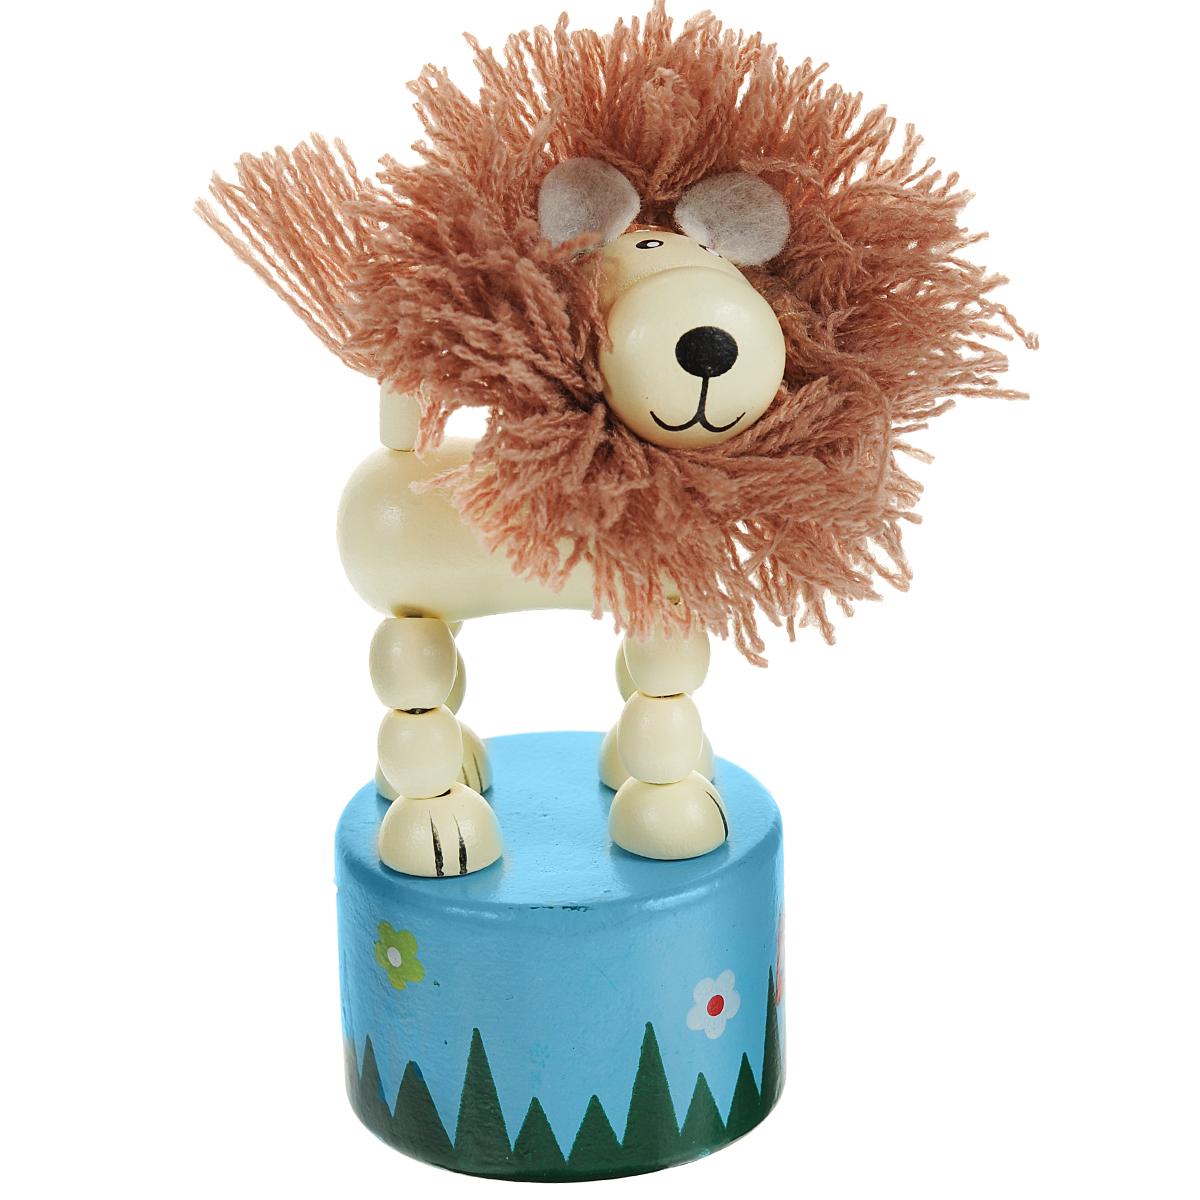 Mapacha Игрушка деревянная Танцующий лев с гривой, цвет: бежевый, голубой колье танцующий мишка